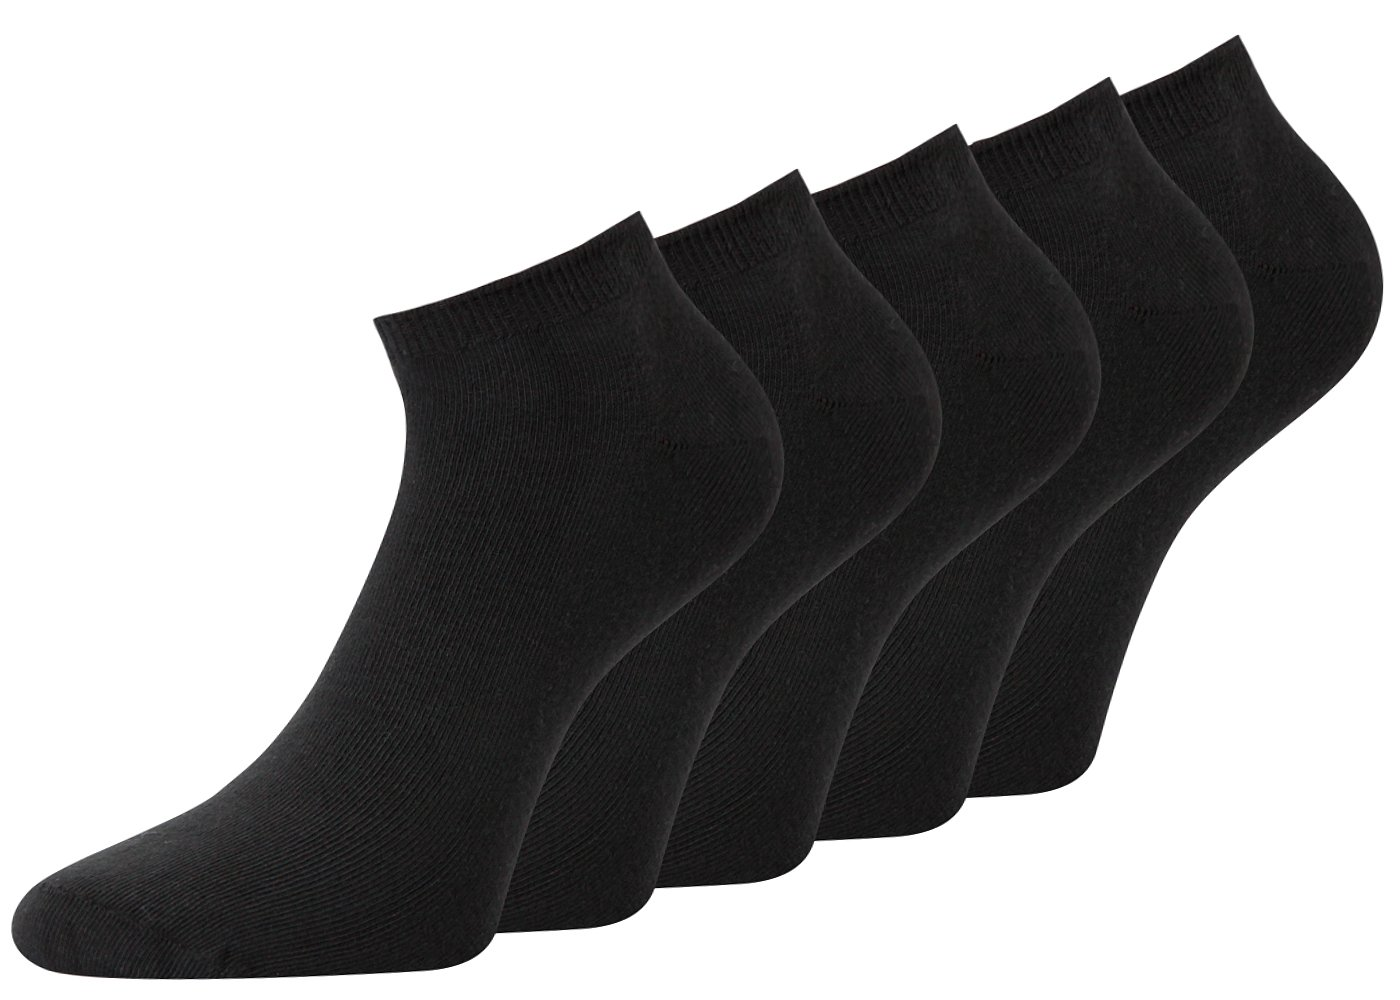 Sneaker Socken Herren Sneaker Socken schwarz und farbig 43-46 47-50 39-42 Baumwolle 10 Paar 1-94000-10